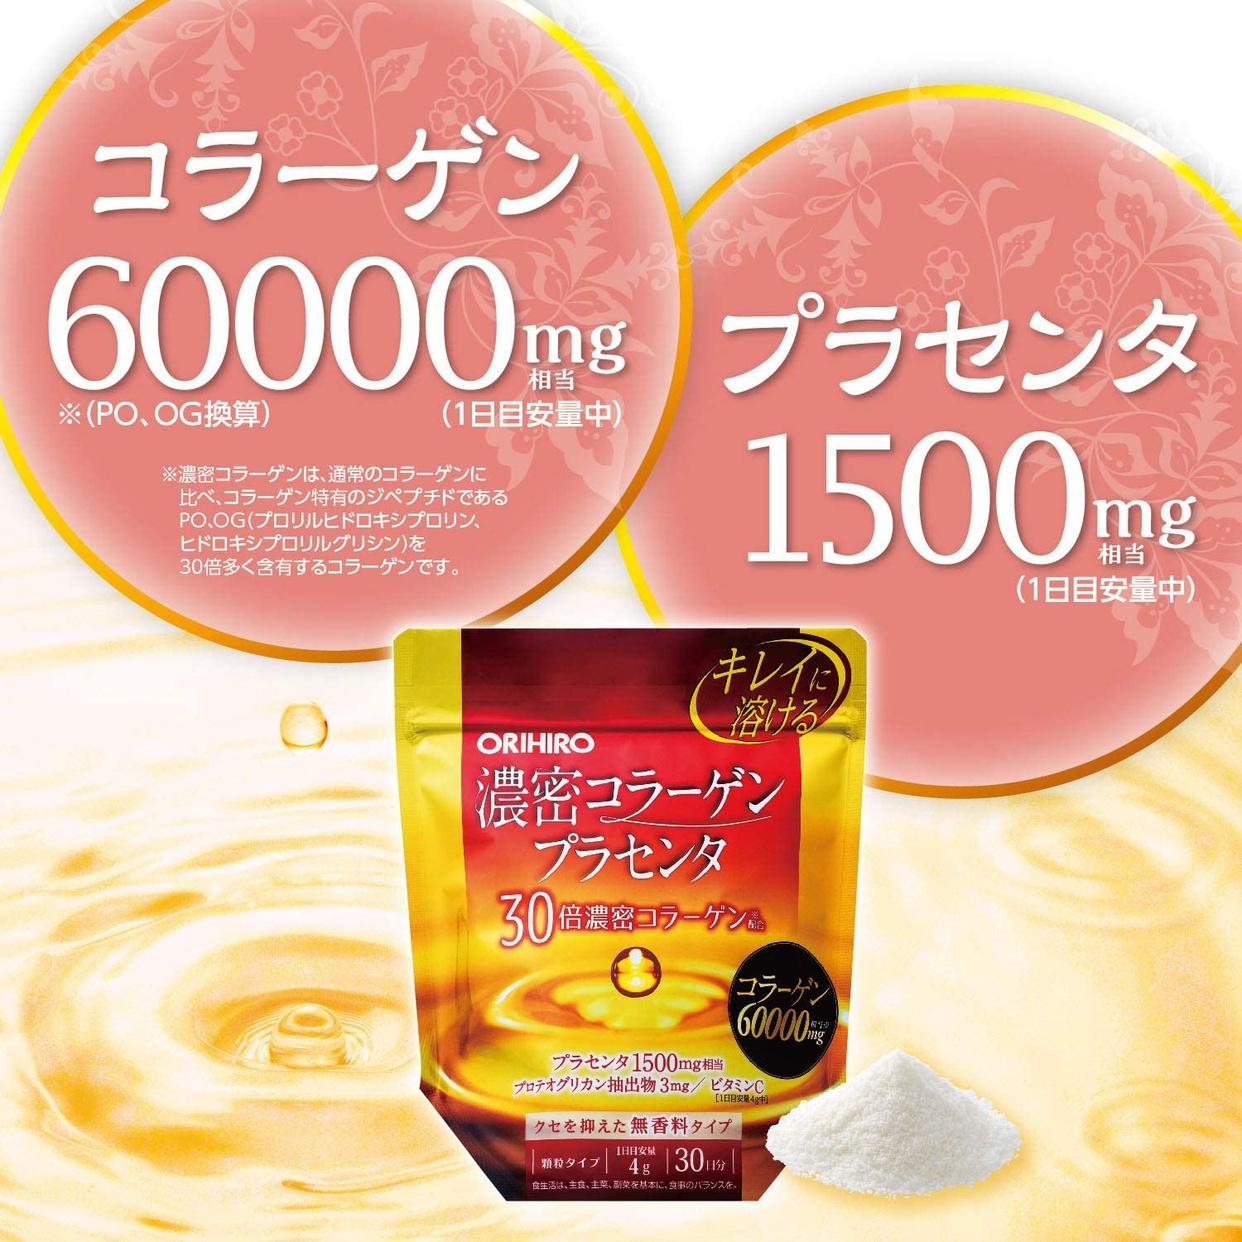 ORIHIRO(オリヒロ) 濃密コラーゲンプラセンタの商品画像4